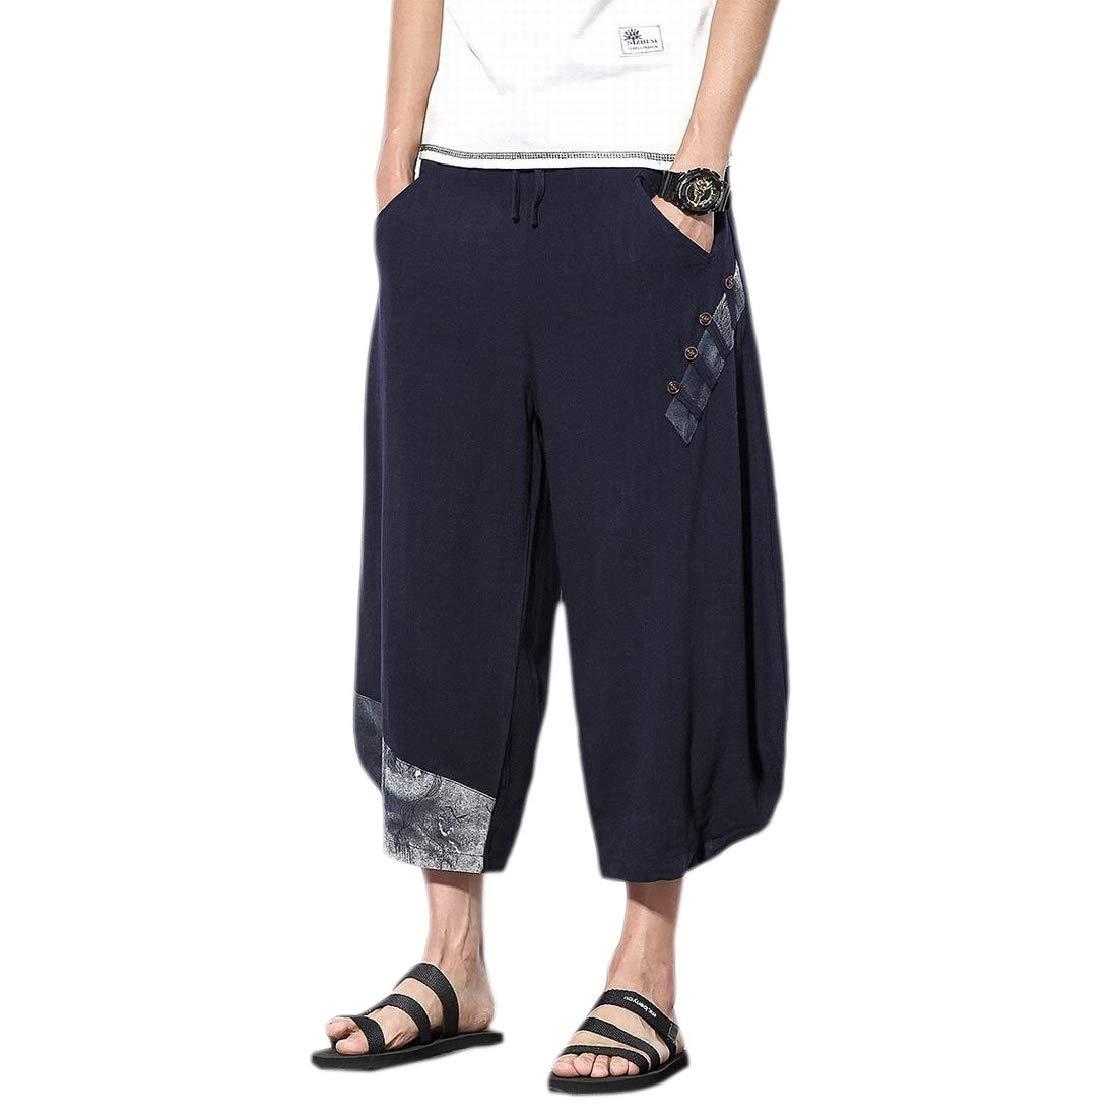 CYJ-shiba Mens Swim Casual Trunks Quick Dry Beach Shorts Drawstring Waist Surf Shorts